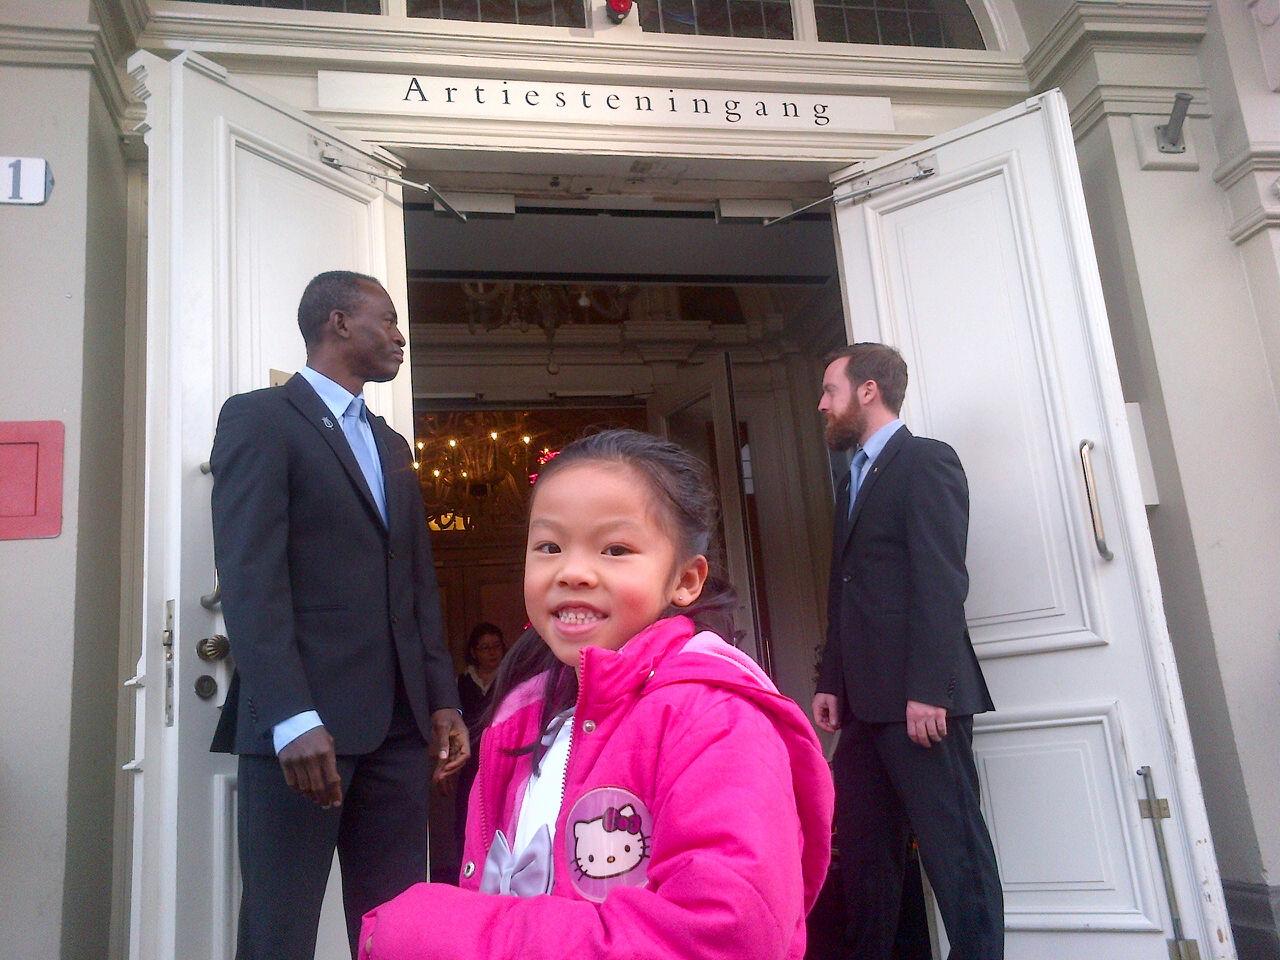 Alyssa at the artist entrance before entering